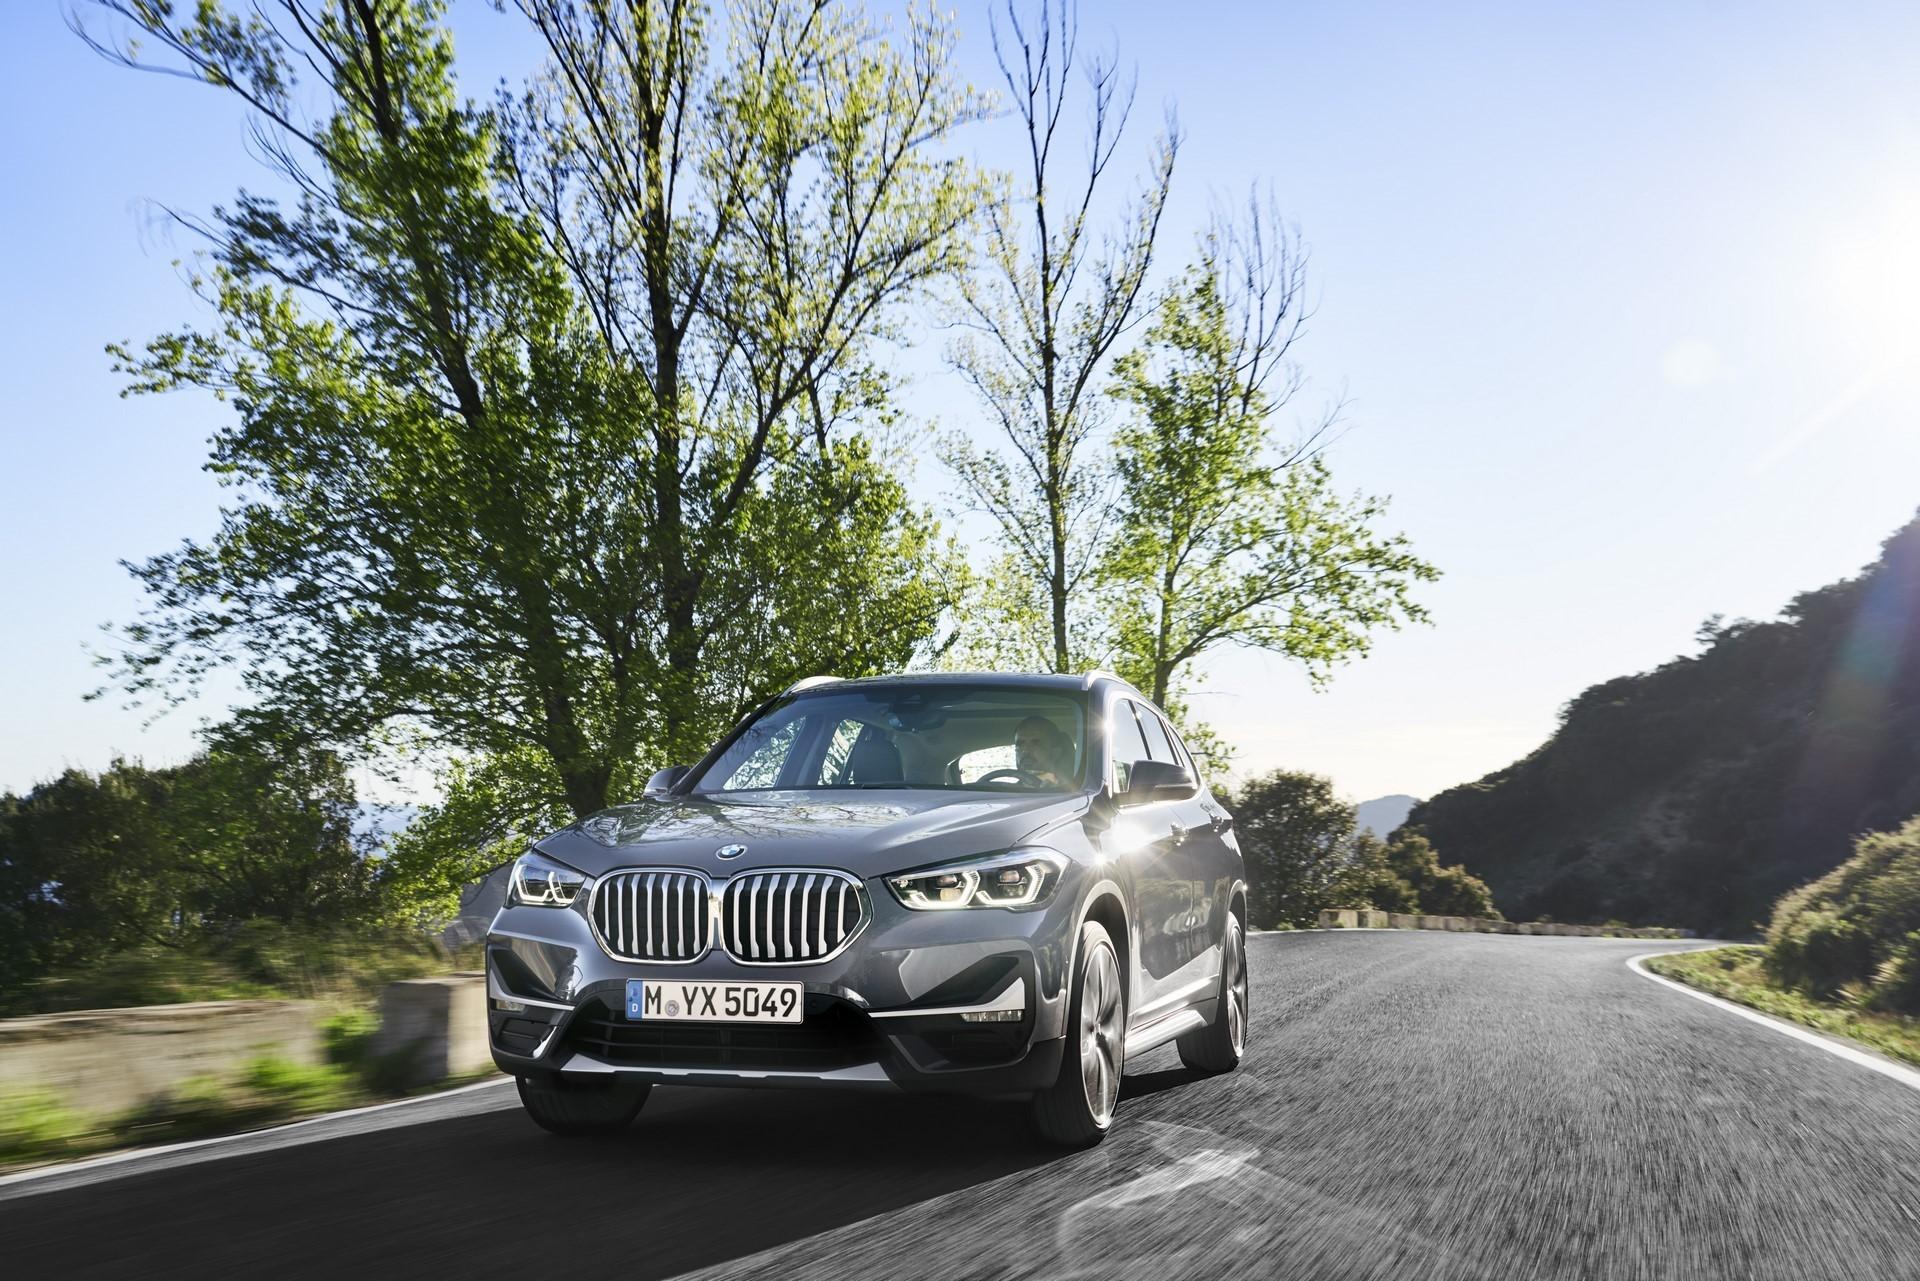 BMW-X1-Facelift-2019-4